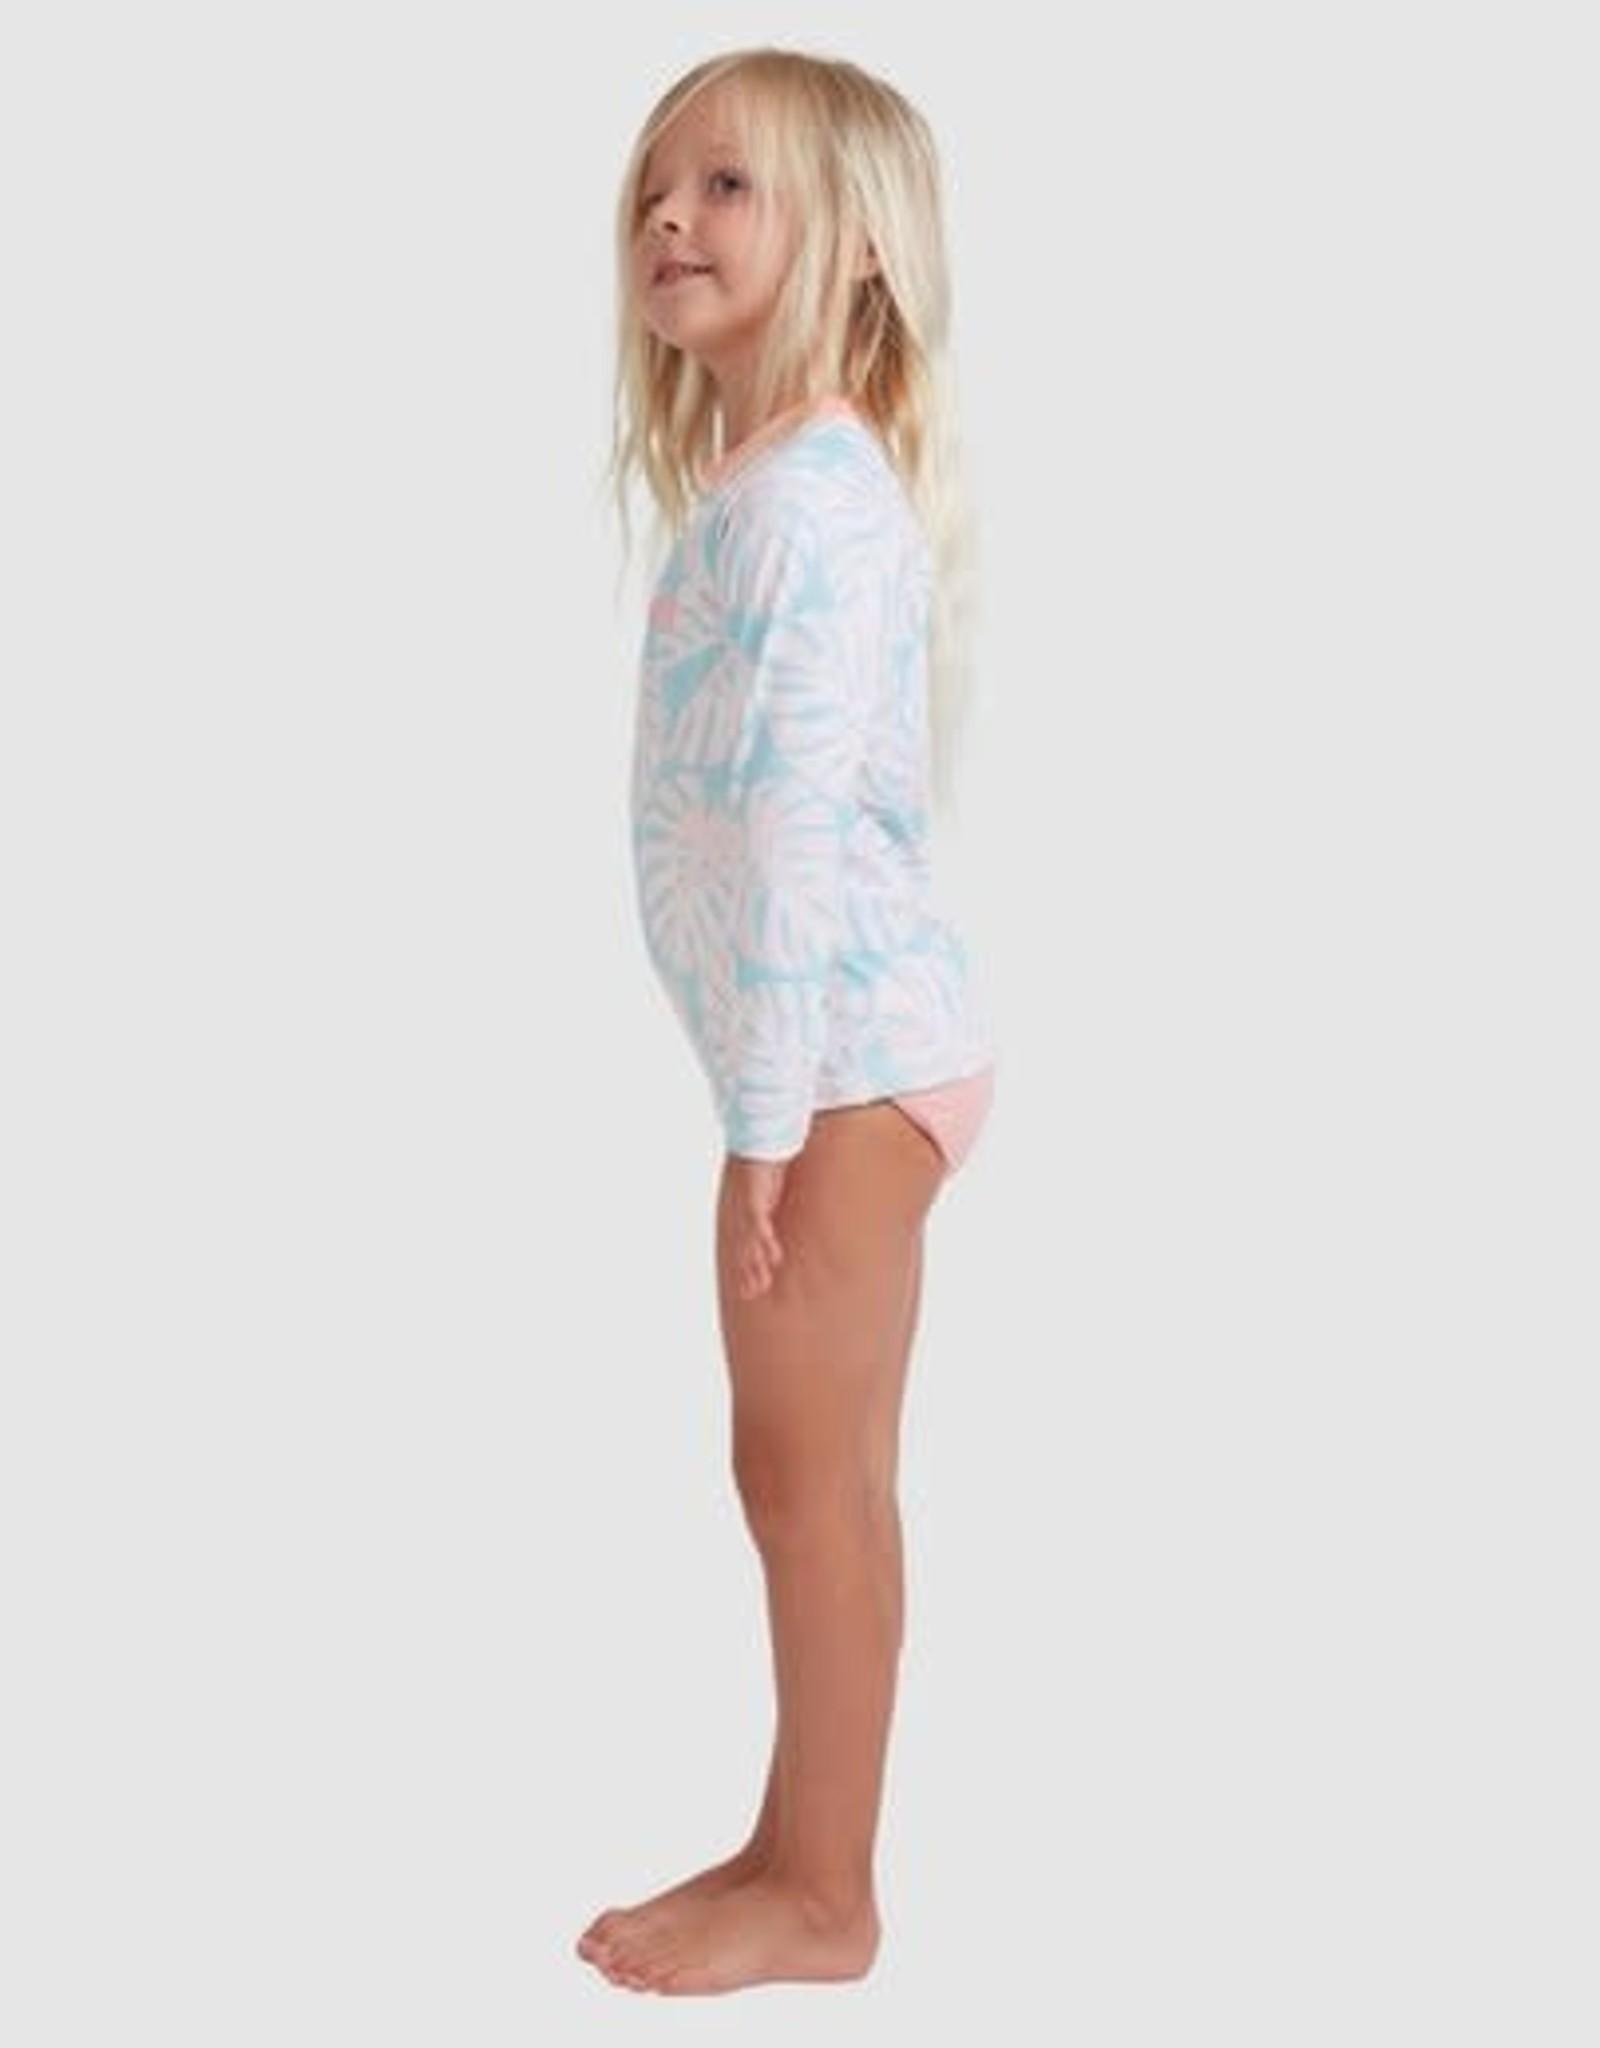 BILLABONG Grom Girls Shady Palms Sunshirt Set